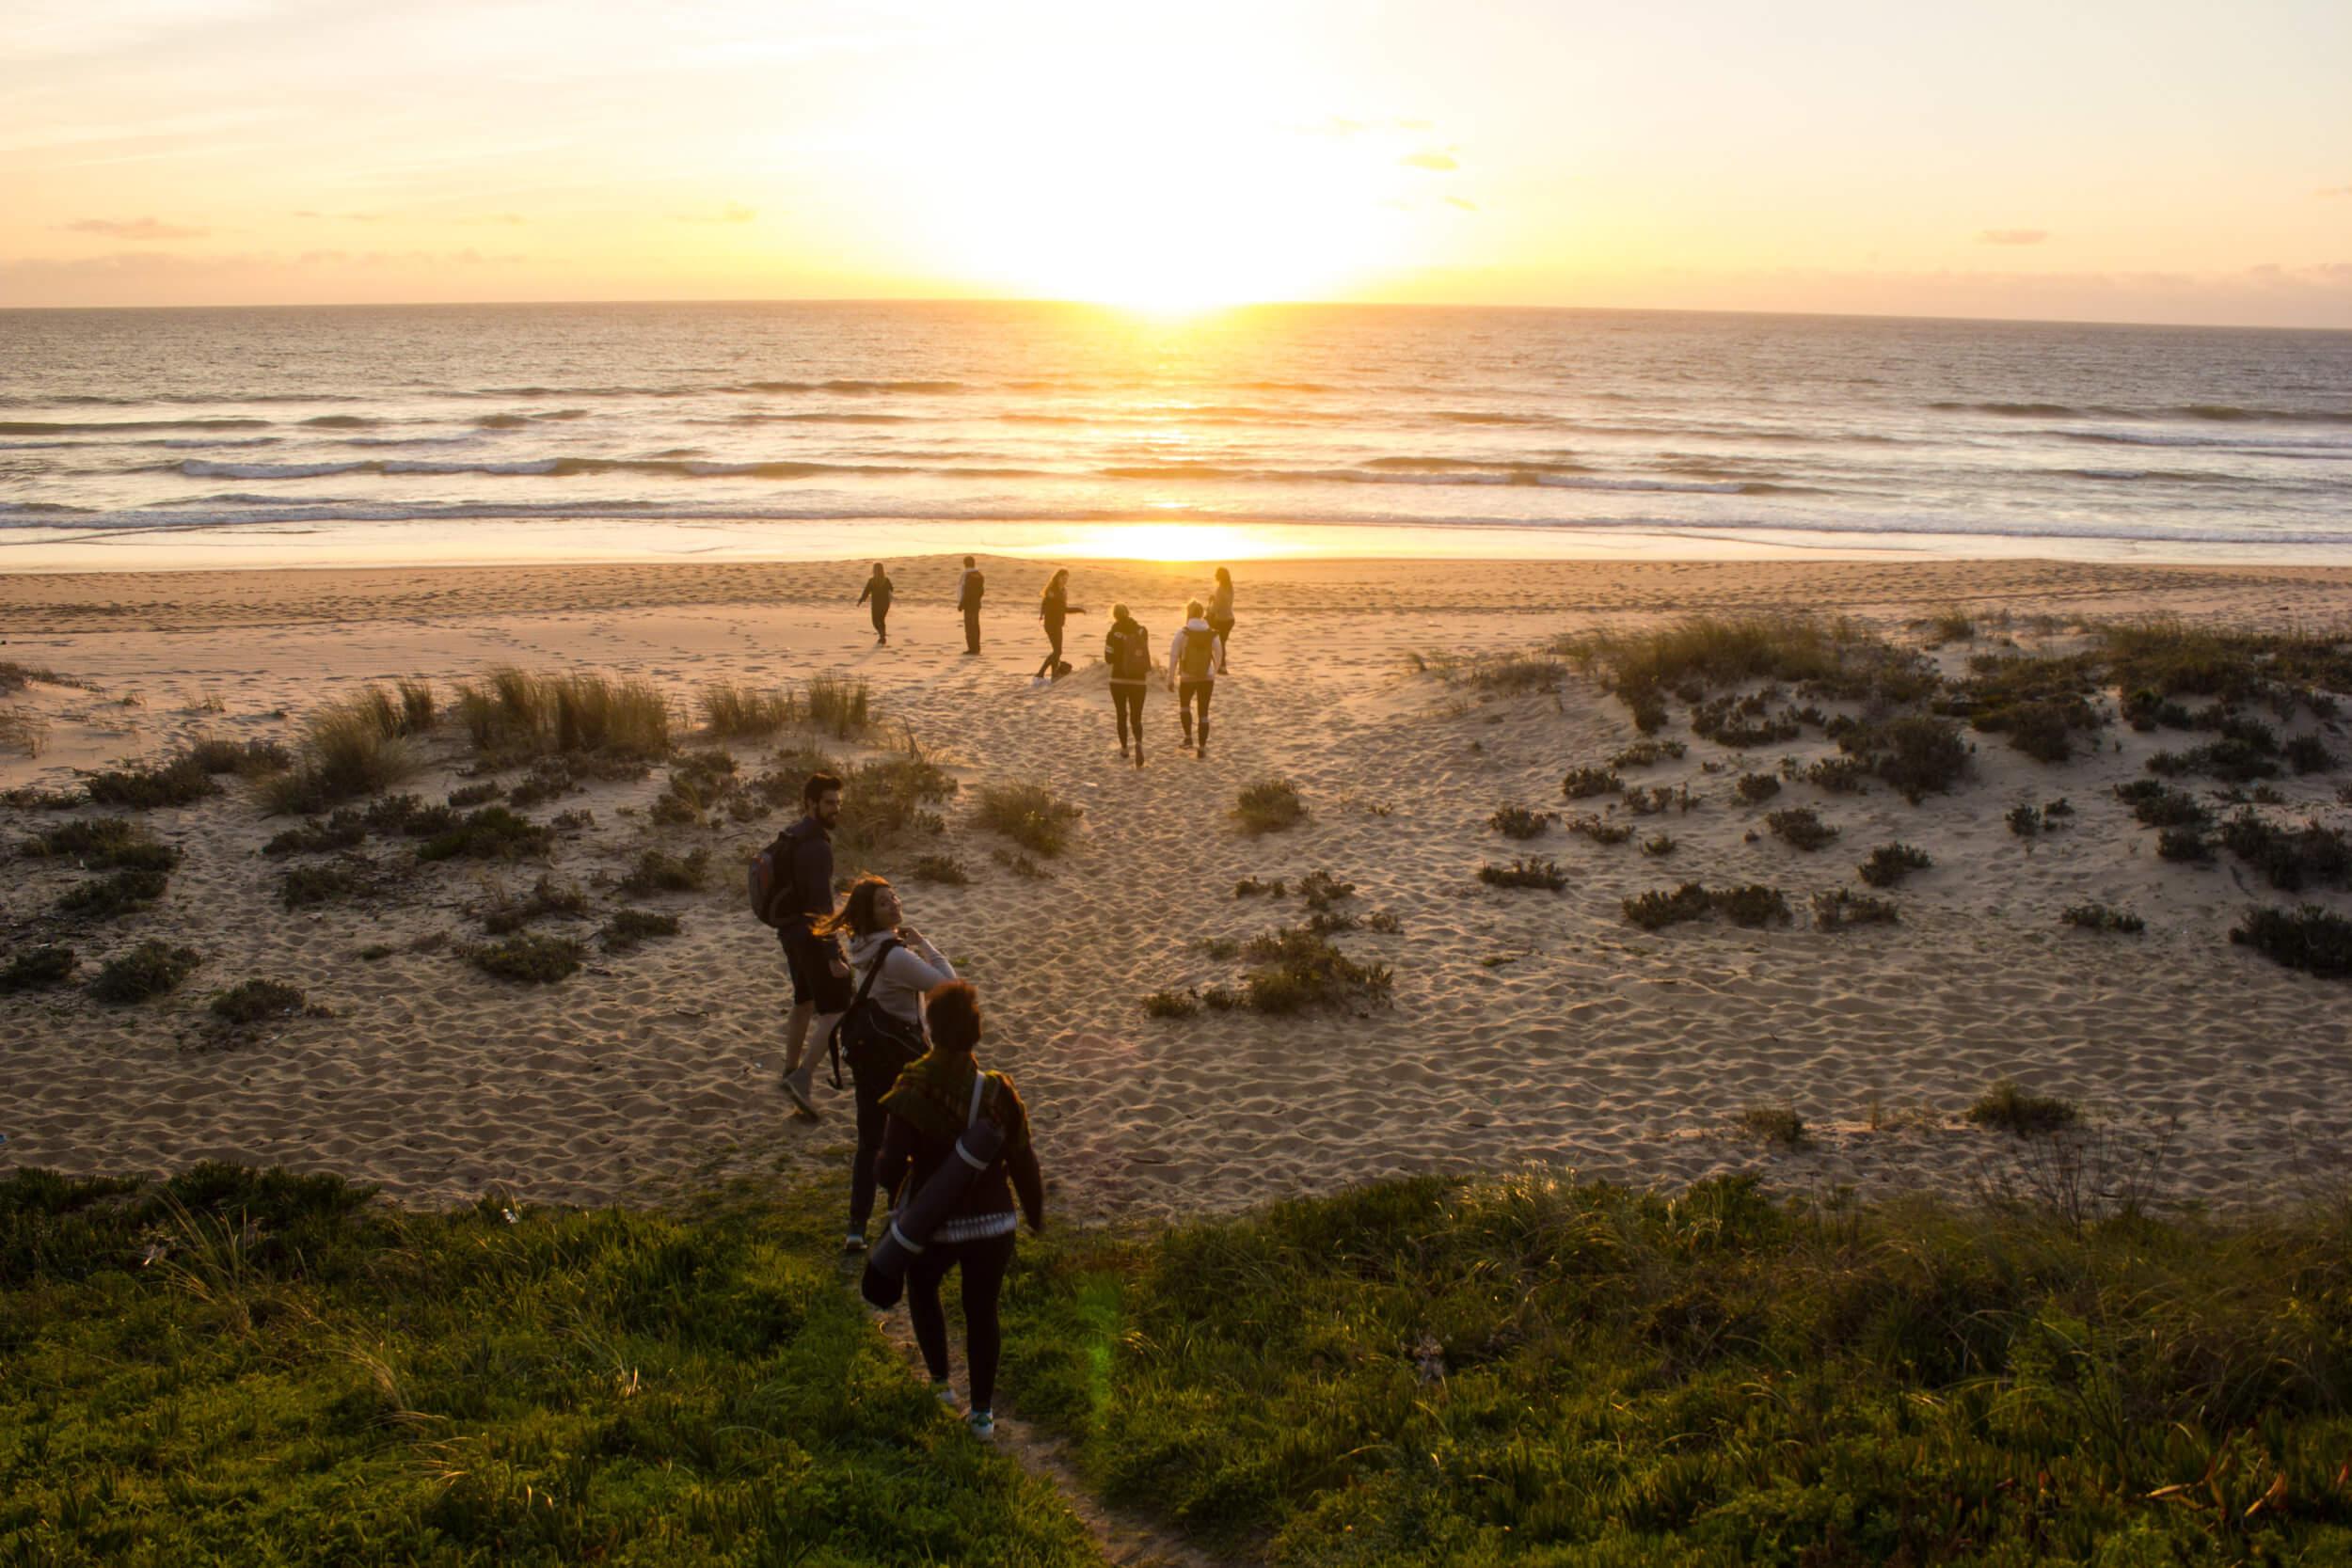 sunset-ocean-beach-breathe-portugal.jpg